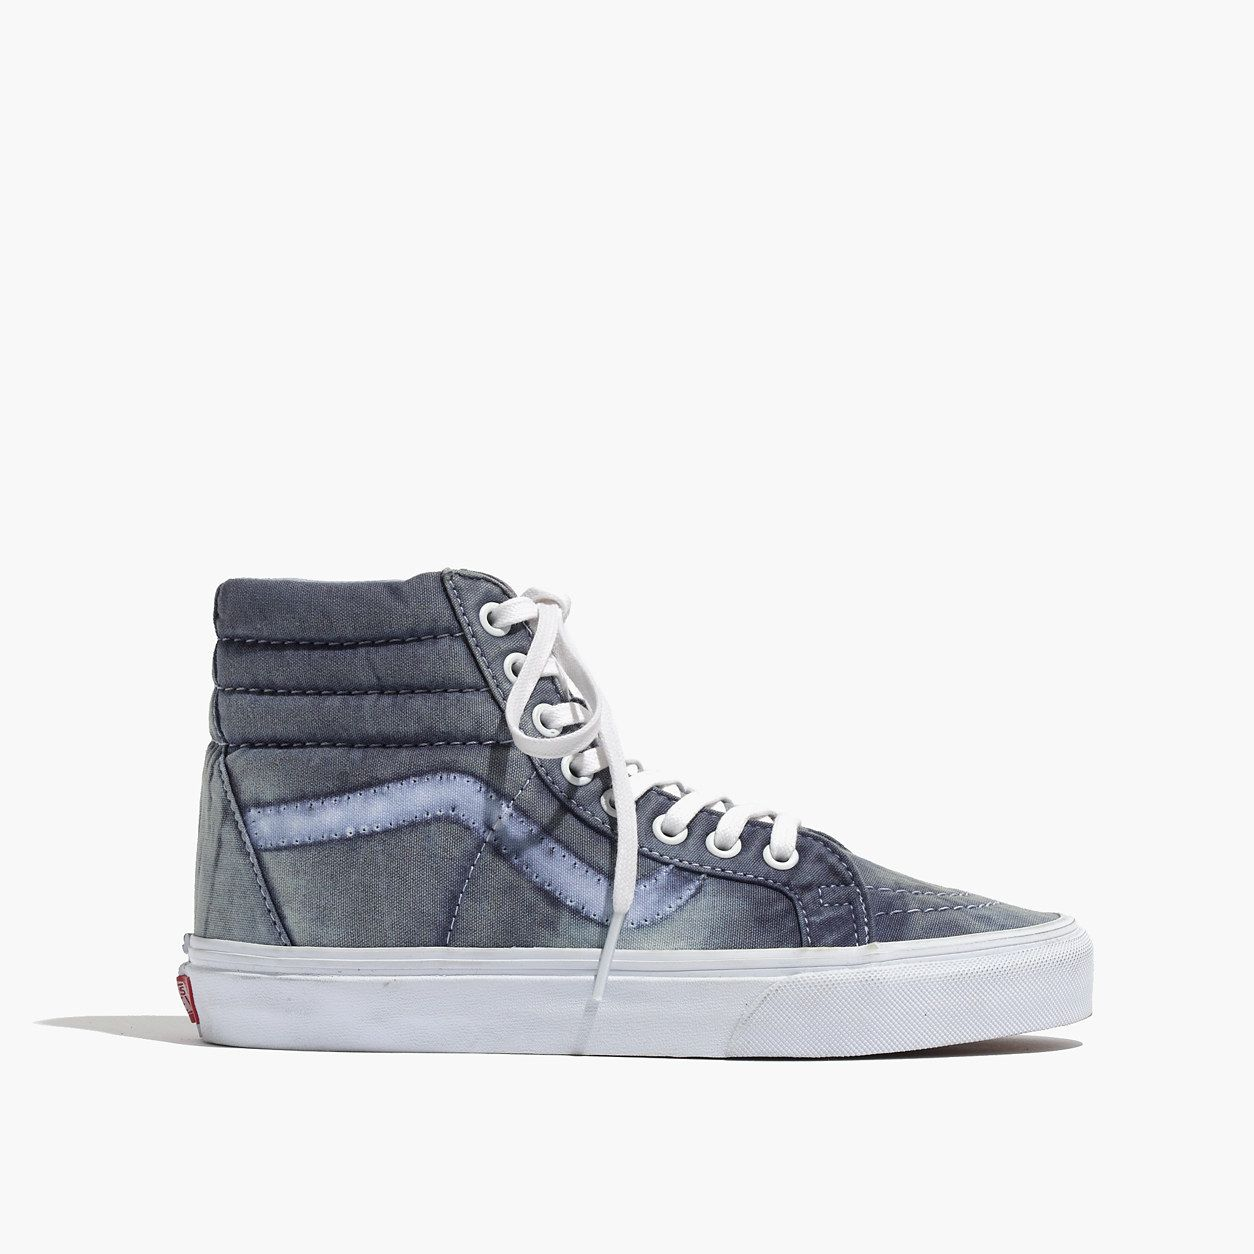 53c993ebad Vans® SK8-Hi Reissue CA High-Top Sneakers   shoes   sandals